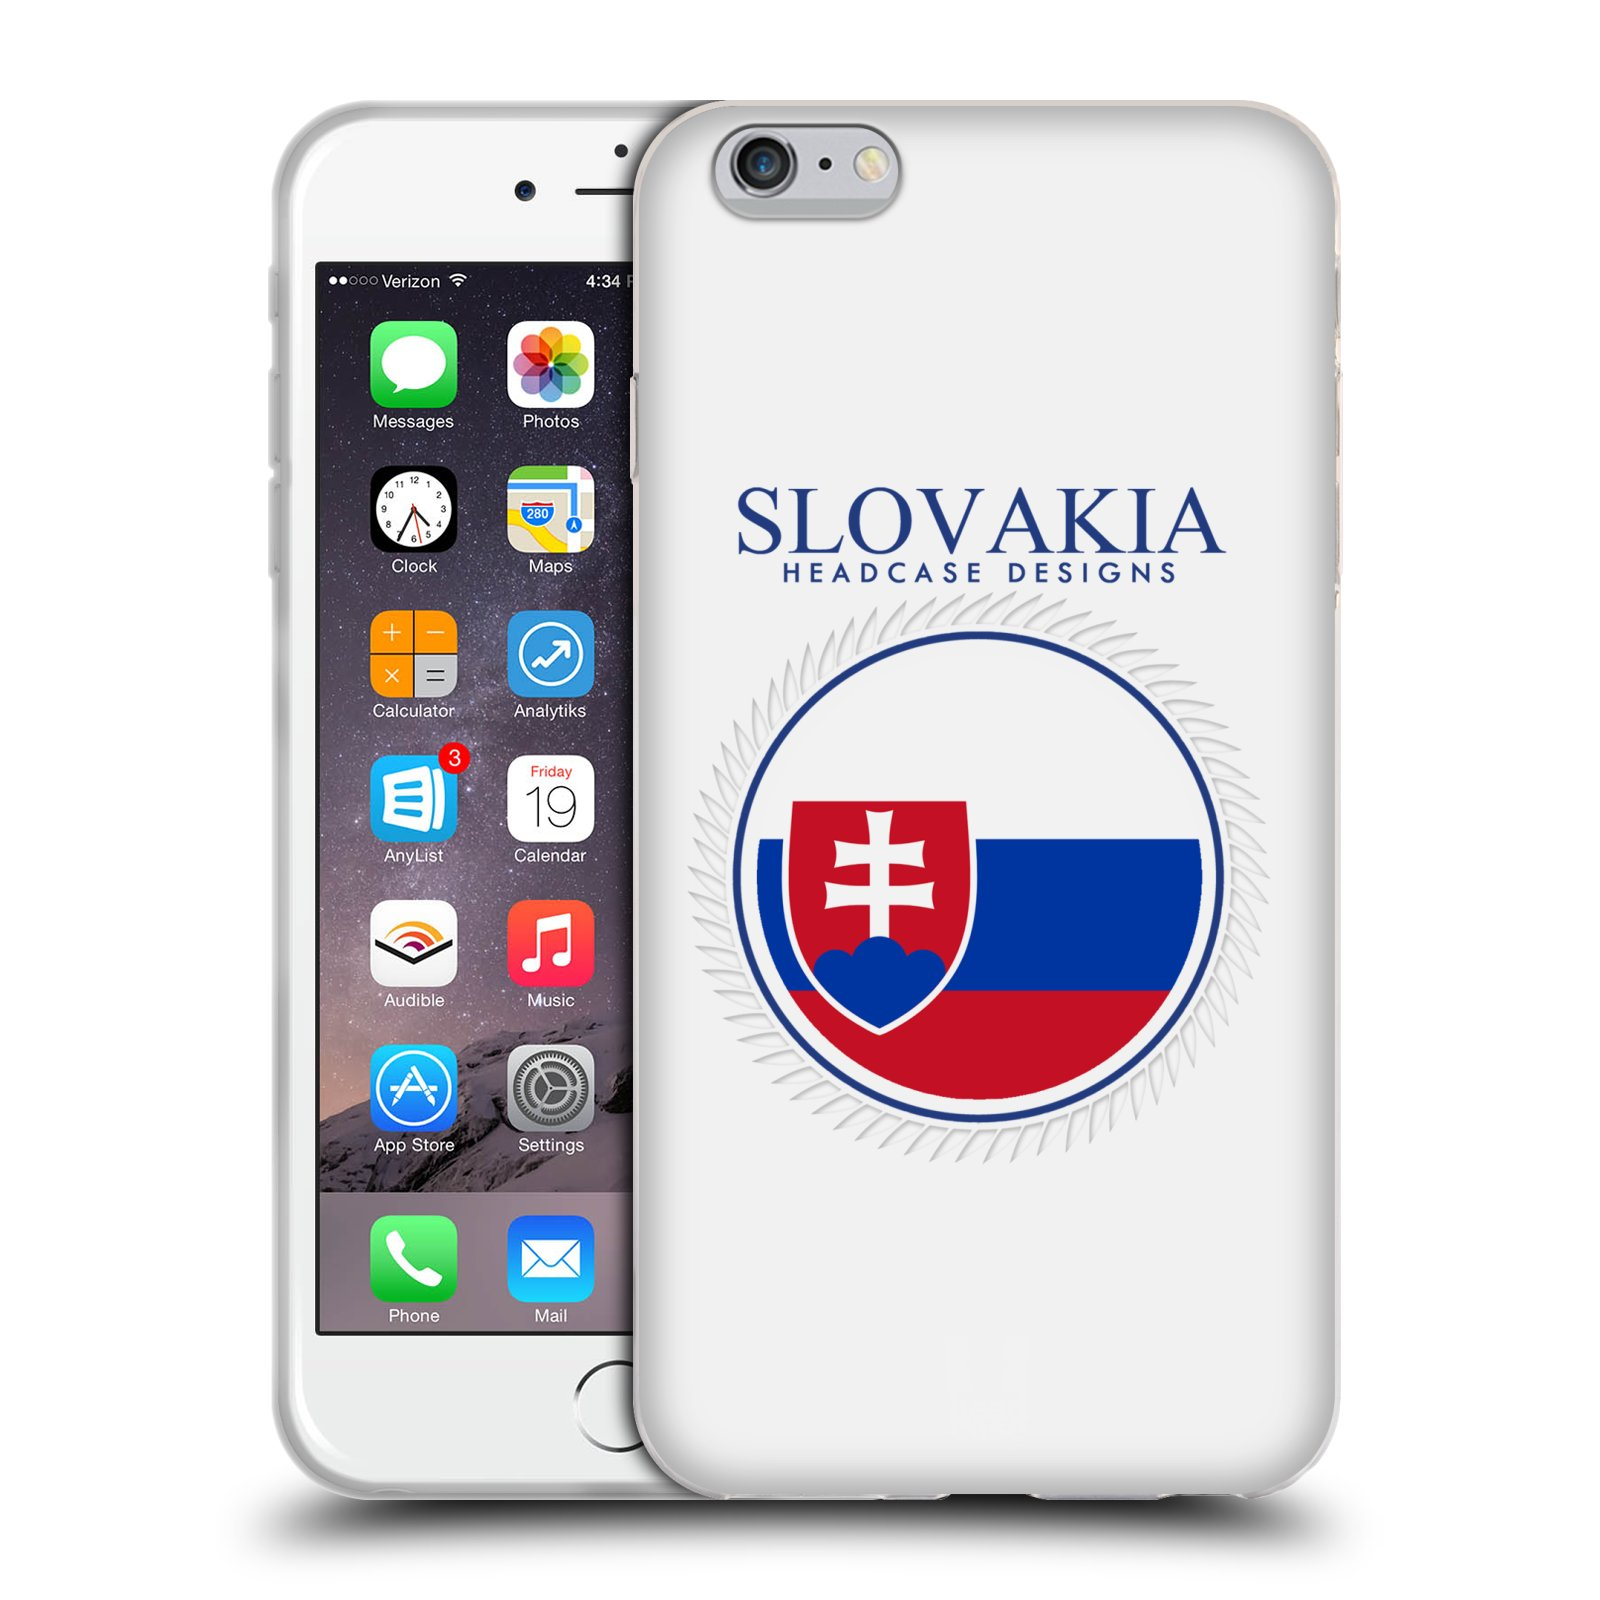 HEAD CASE silikonový obal na mobil Apple Iphone 6 PLUS/ 6S PLUS vzor Vlajky státy 2 SLOVENSKO